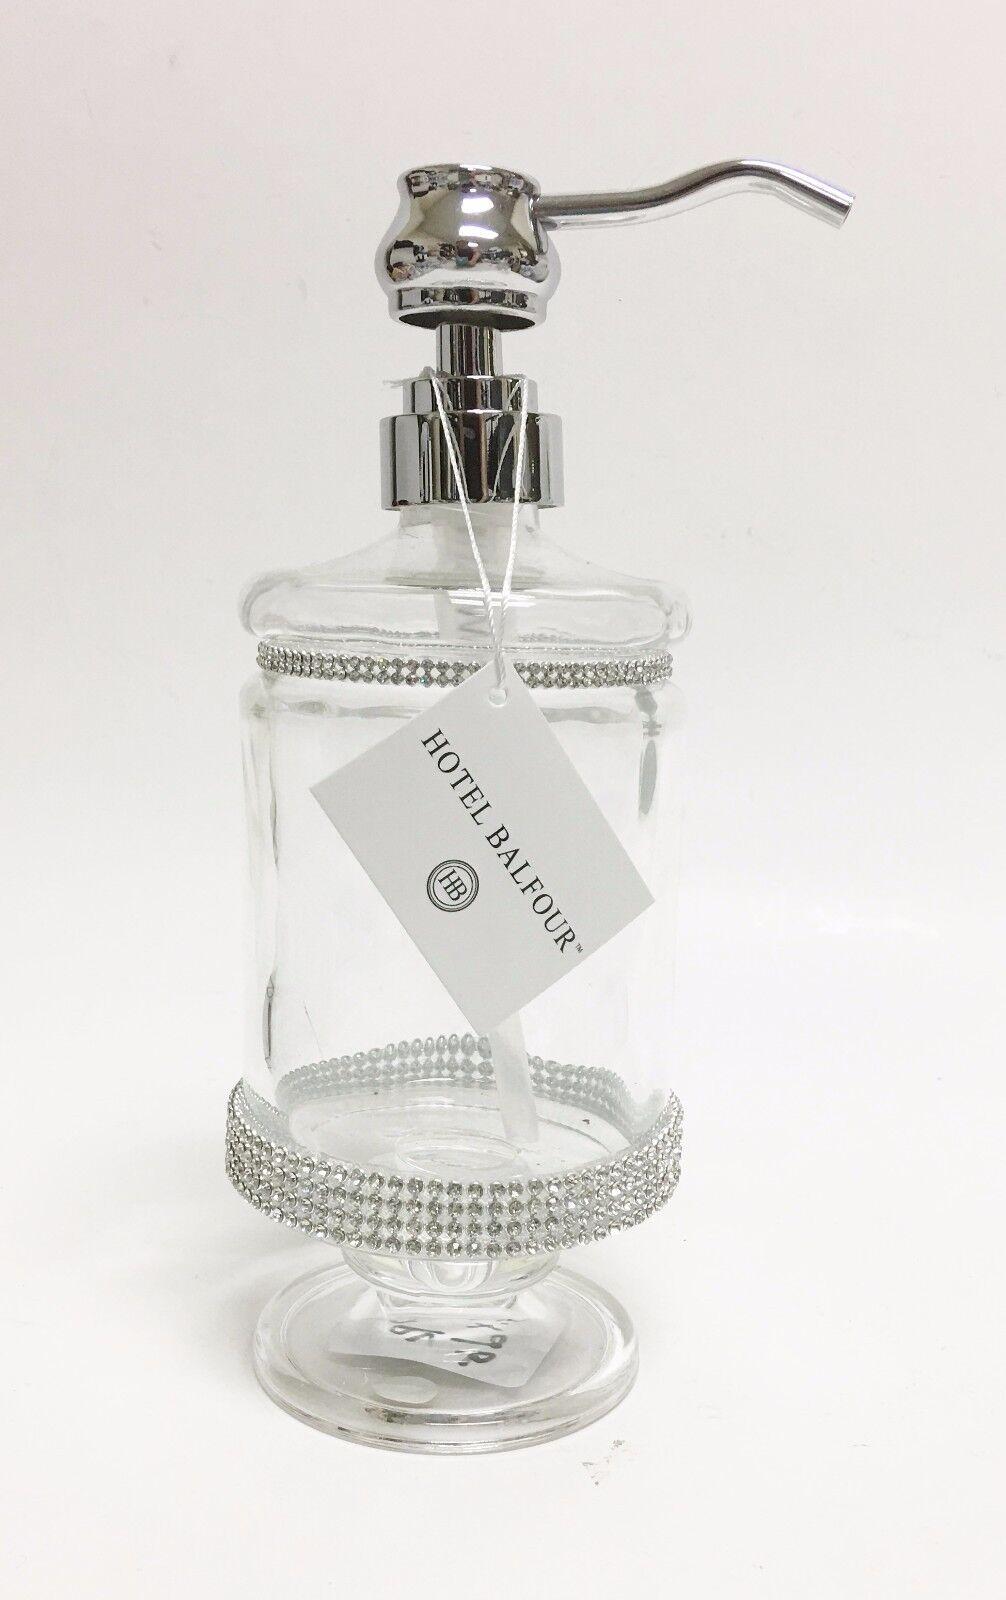 Neu Hotel Balfour Klar Glas Kristall Kuche Badezimmer Seife Lotion Spender Ffaacf